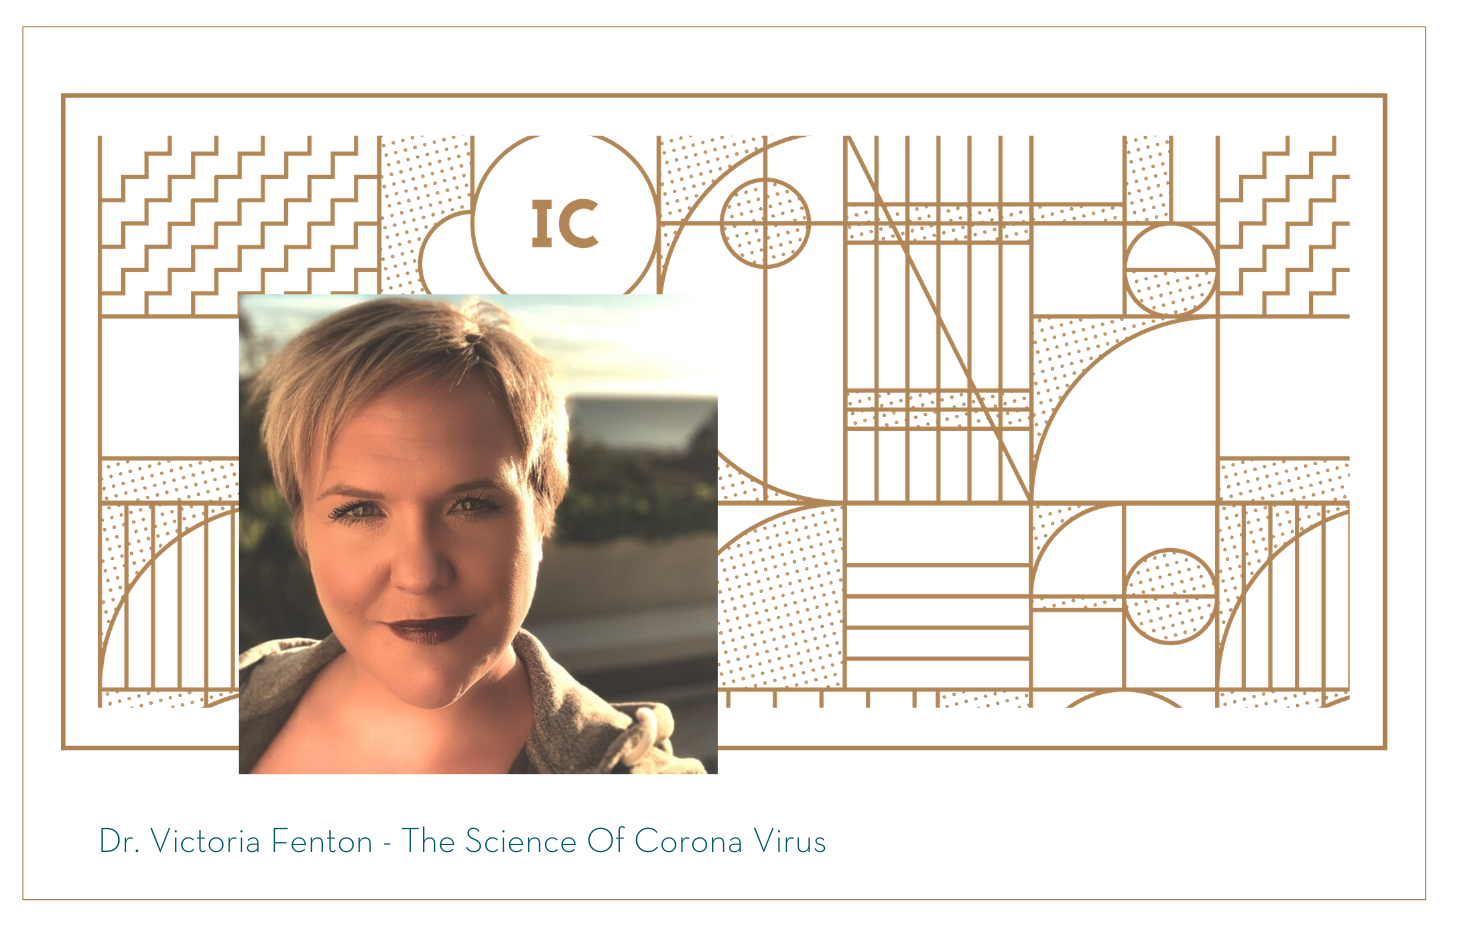 Dr Victoria Fenton - The Science of Corona Virus